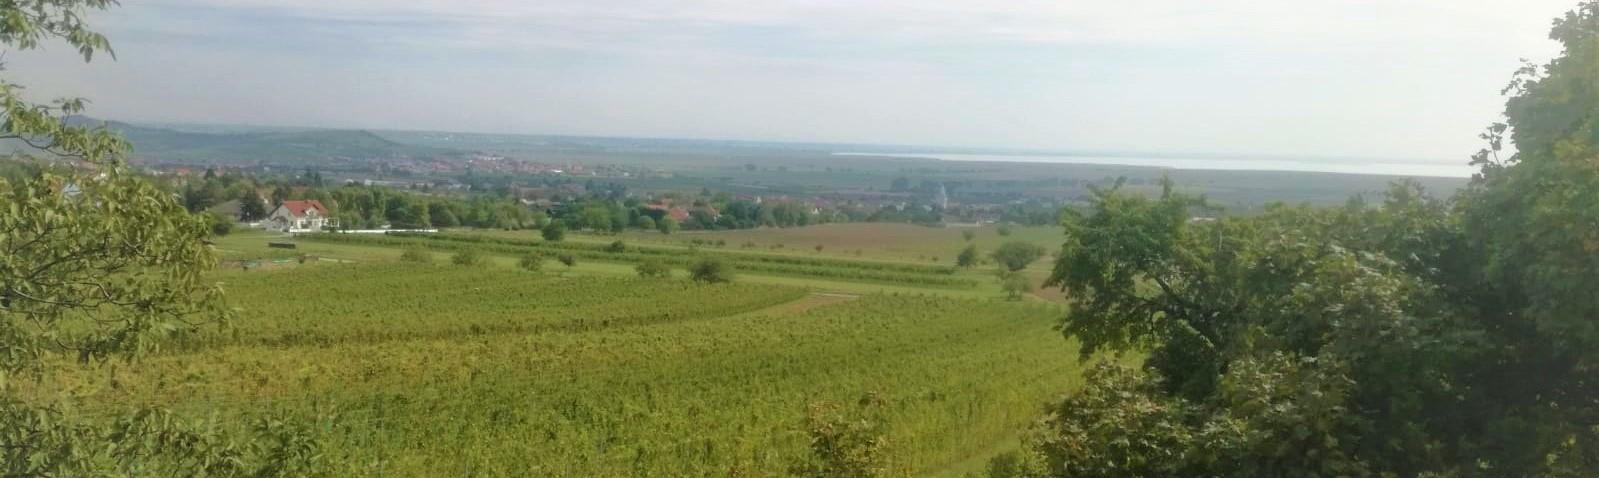 Weinbaugebiet des Monats